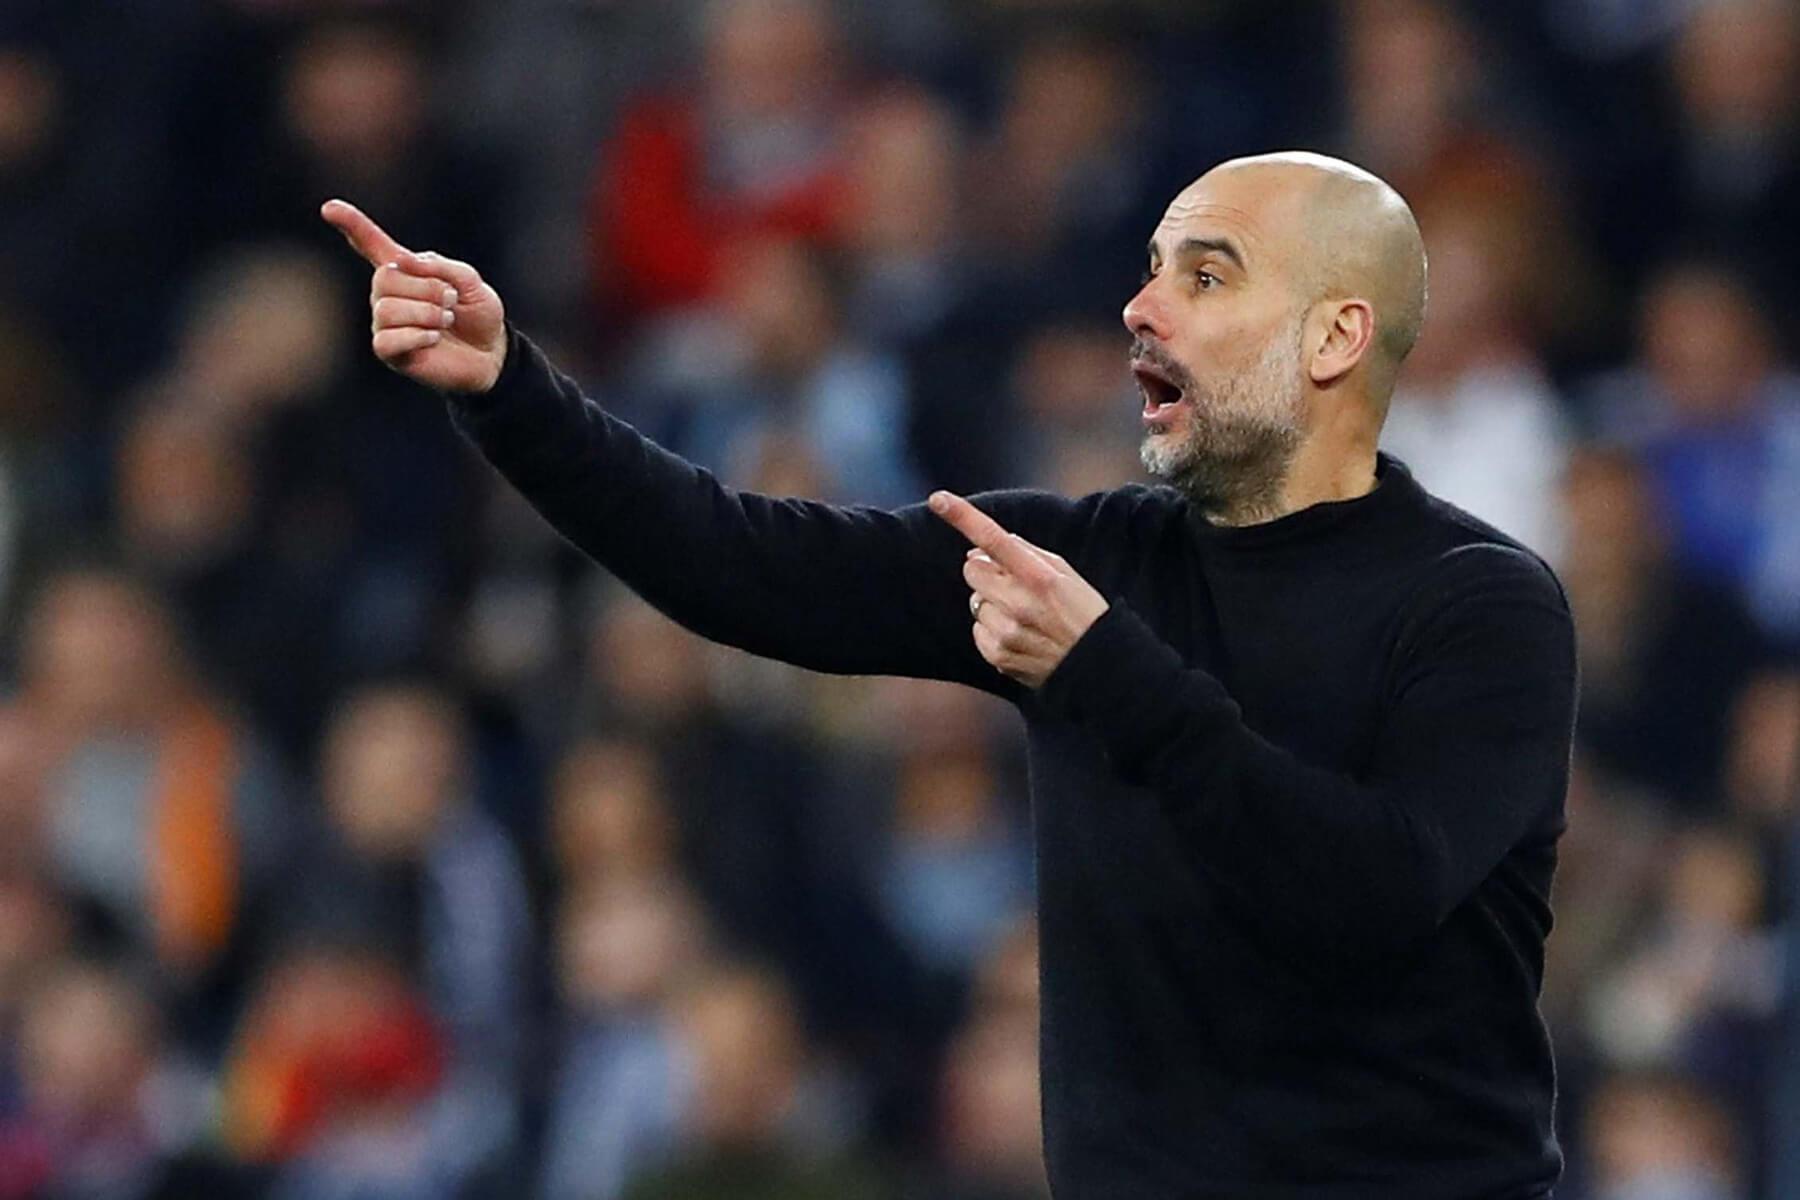 Тренер «Манчестер Сити» Пеп Гвардиола. Фото: Reuters